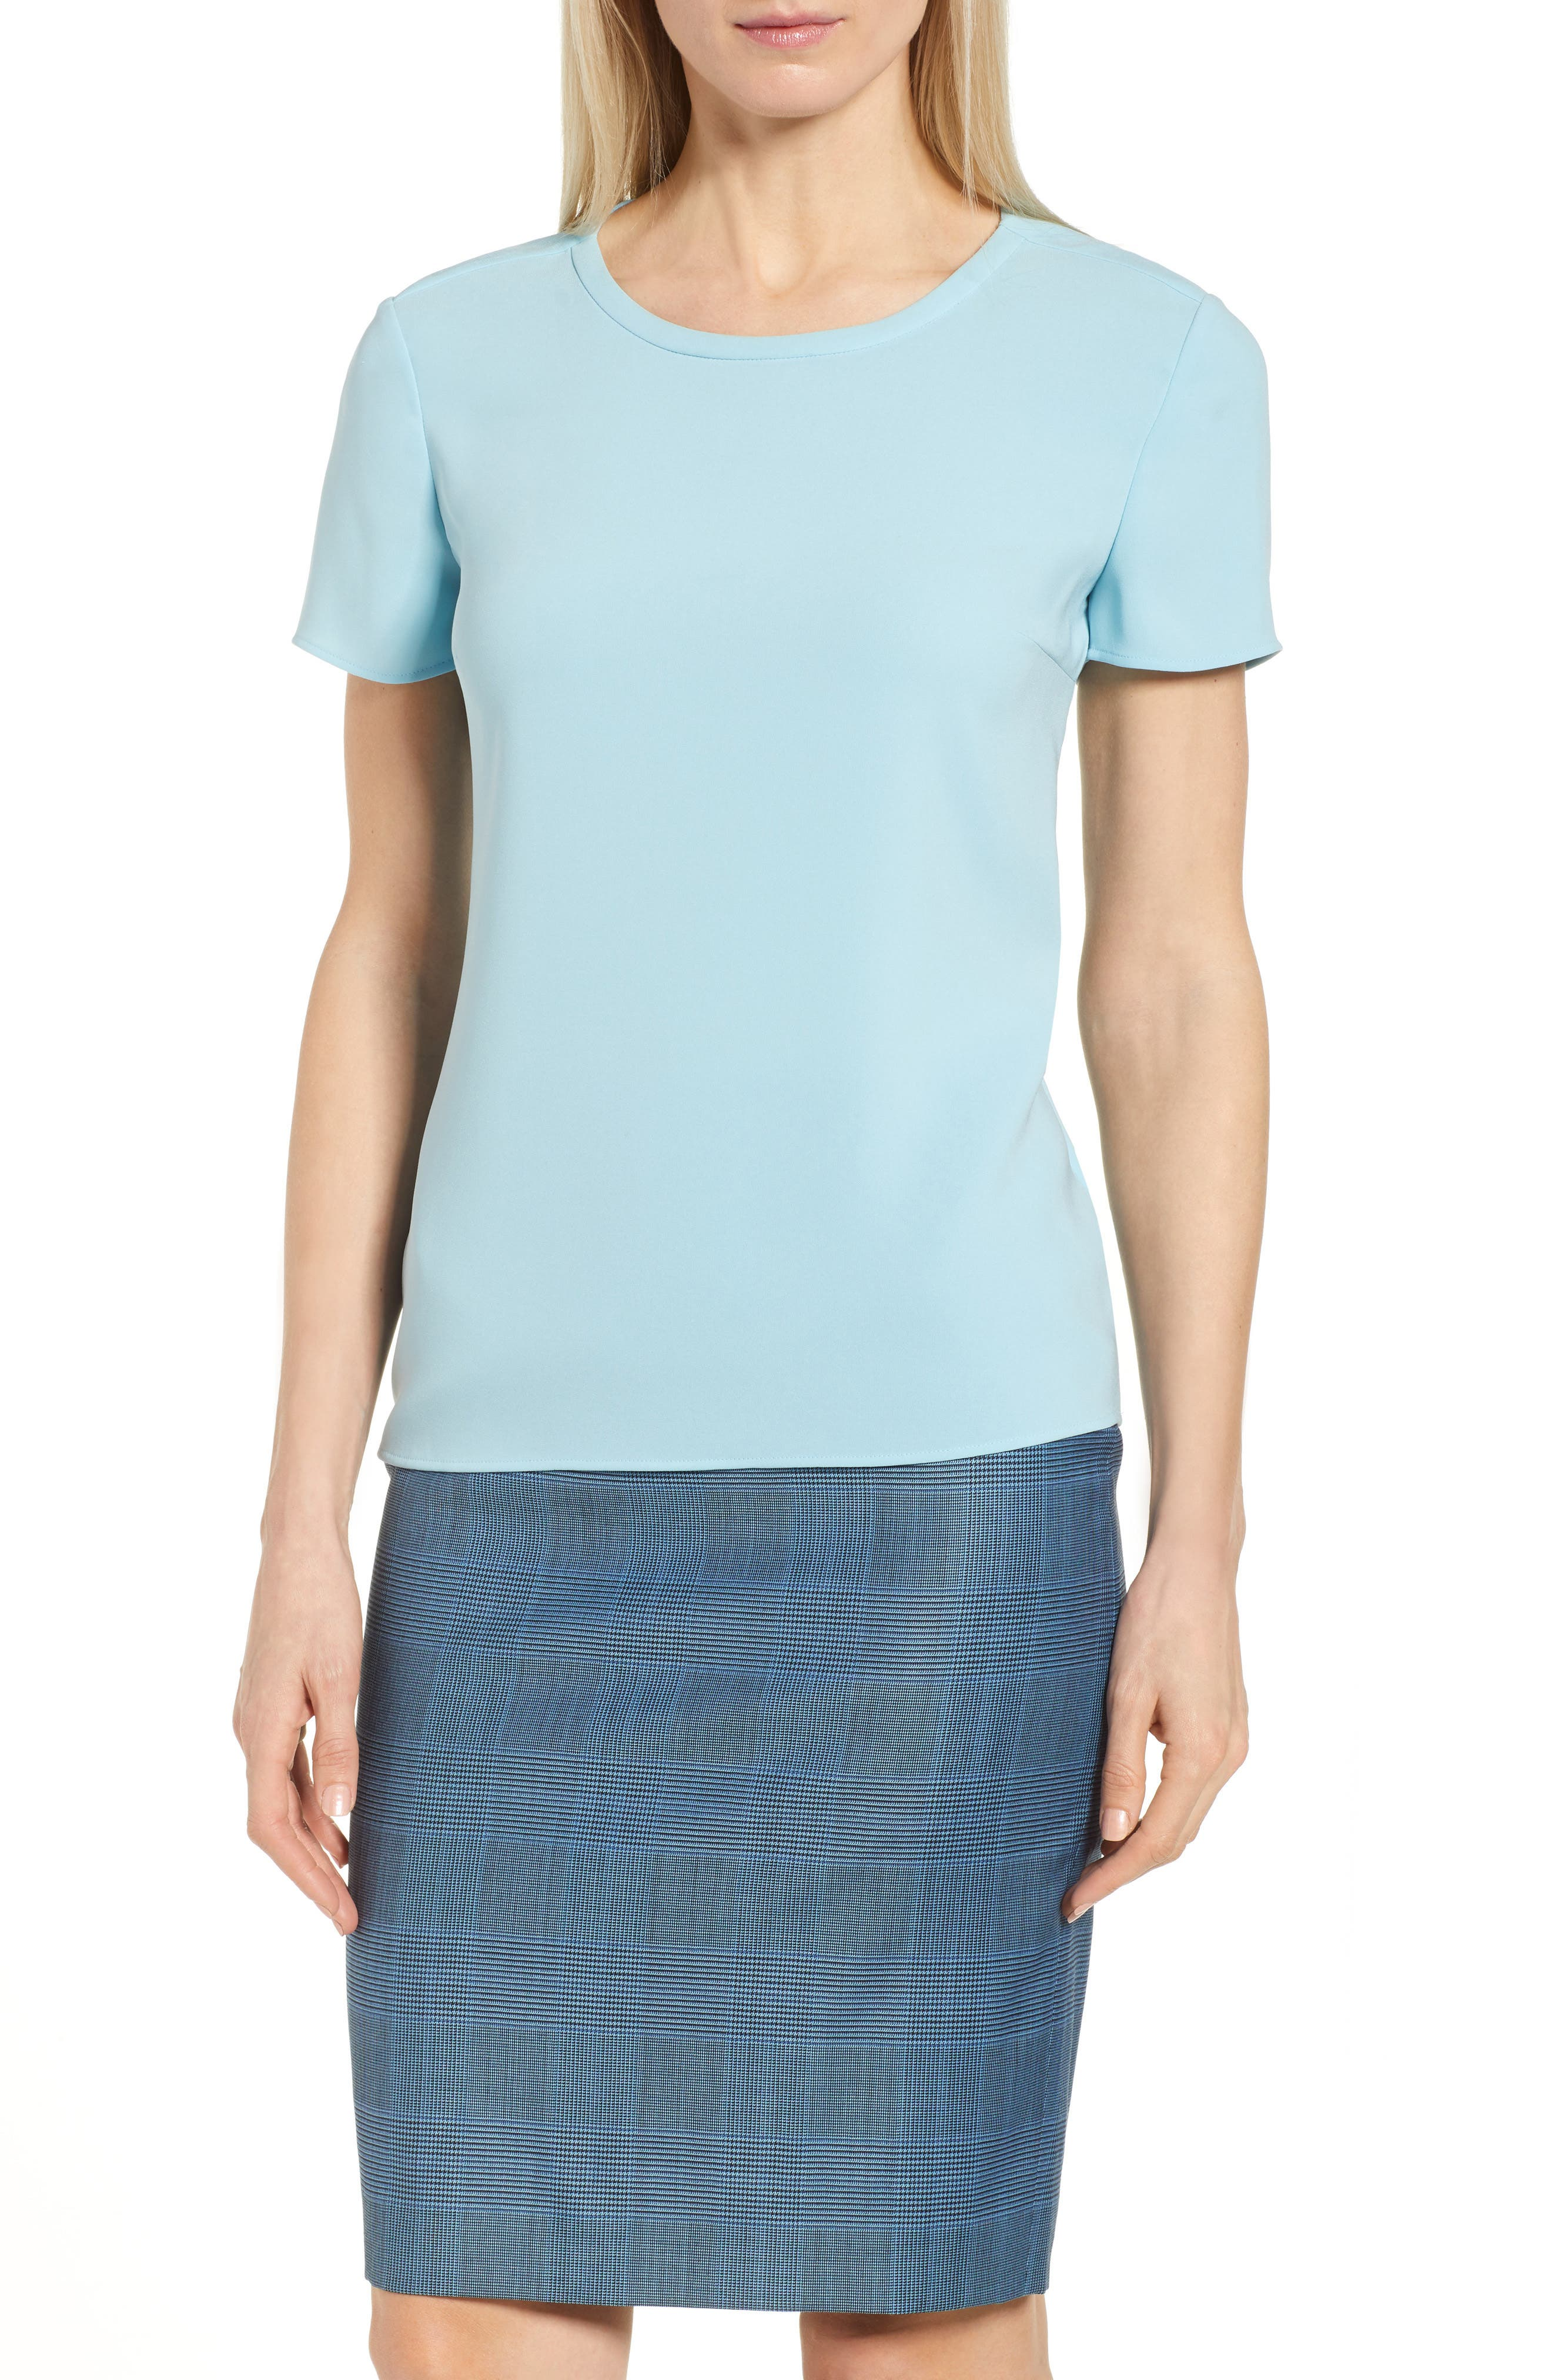 Ilyna Crepe Short Sleeve Top,                         Main,                         color, Lagoon Blue